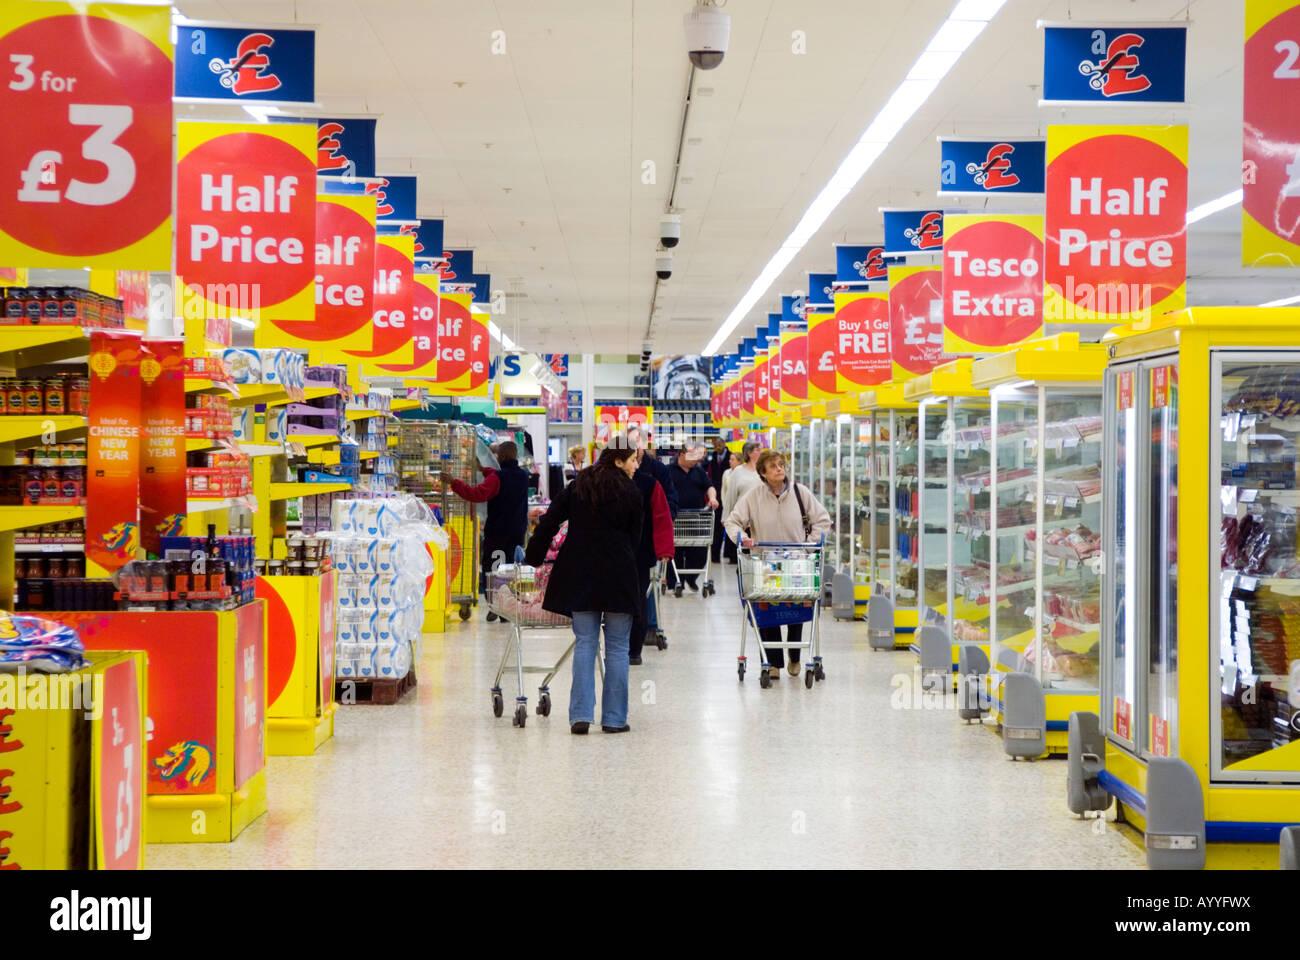 Supermarket Aisle Signs